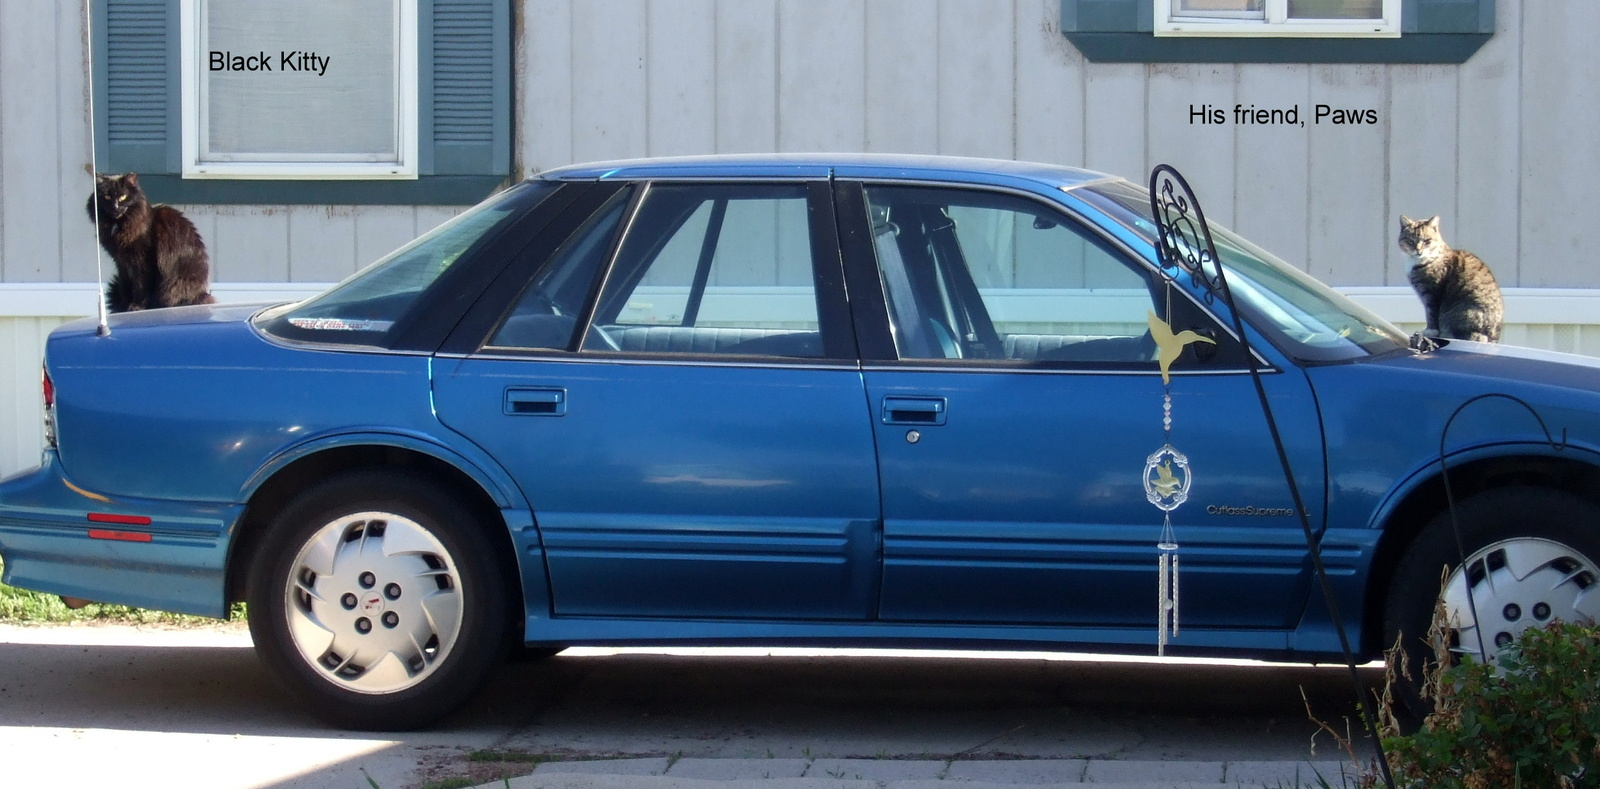 hight resolution of oldsmobile cutlass supreme questions car loses power while driving 1996 oldsmobile ciera blue 1996 oldsmobile ciera fuse box